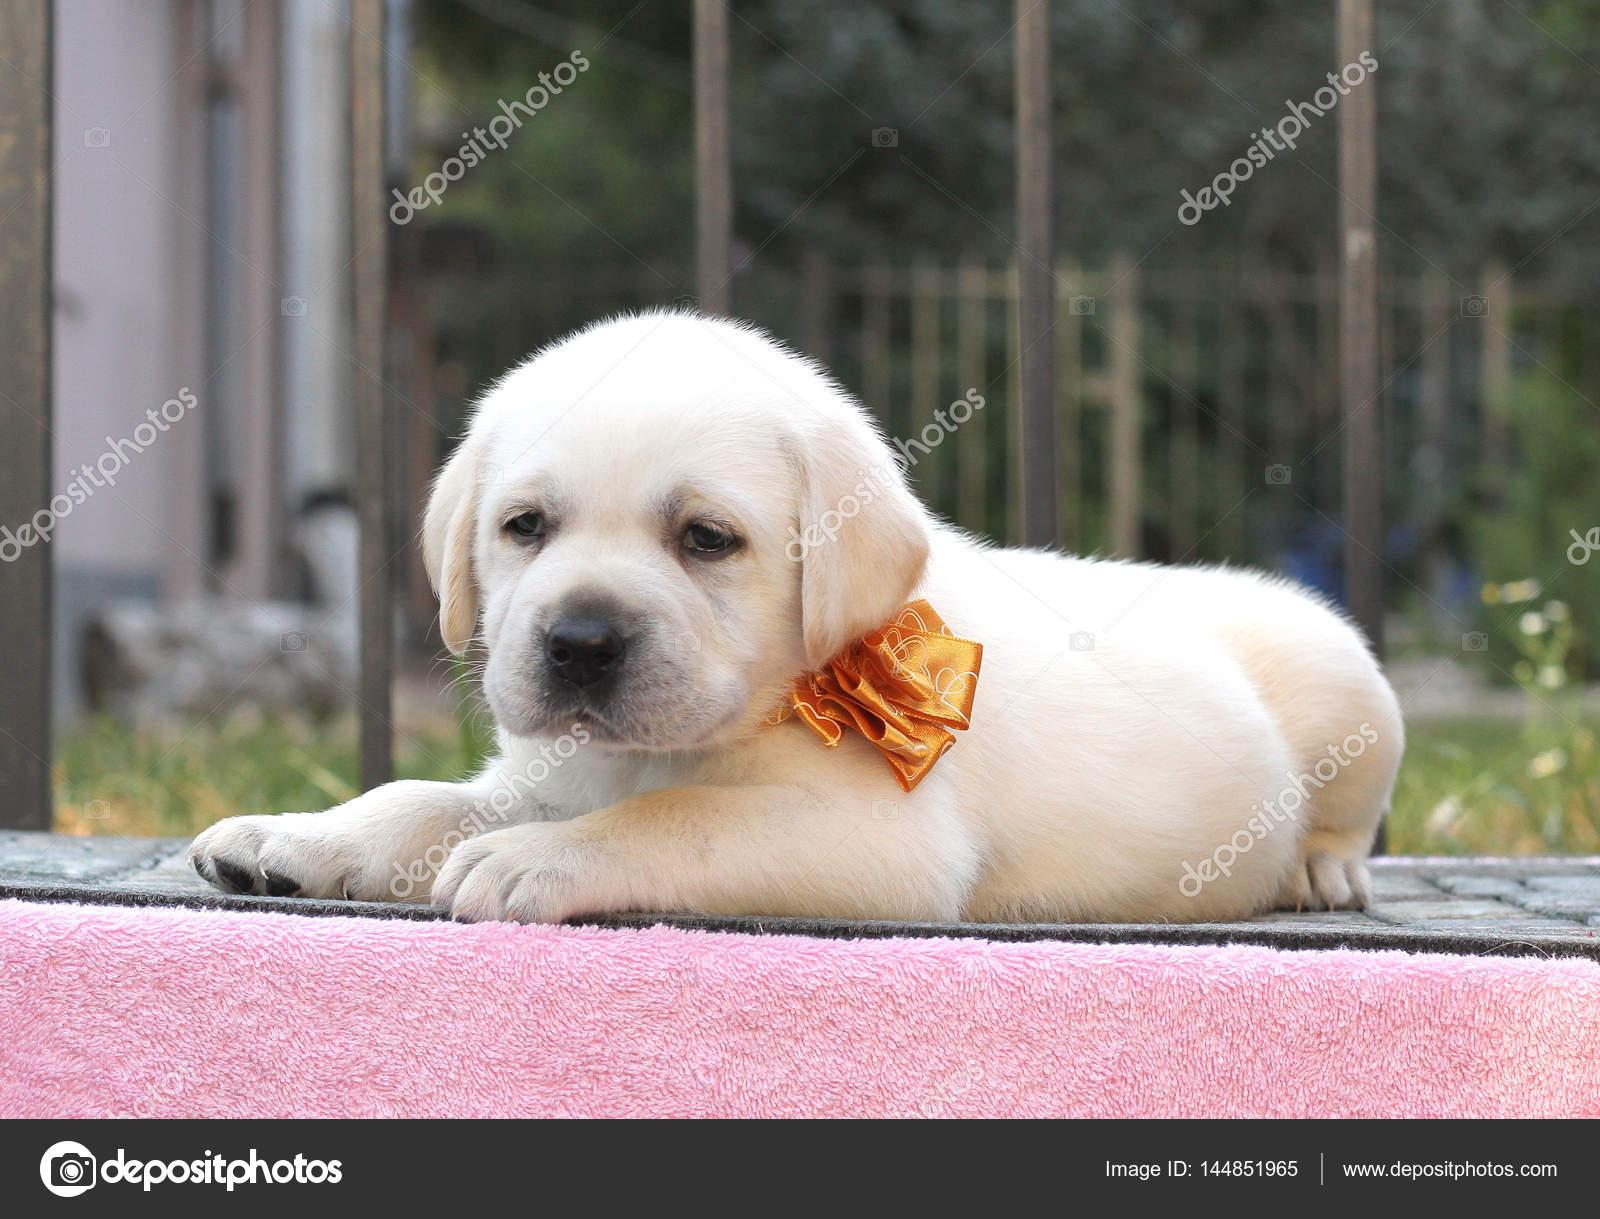 Pics Lebra Dogs Little Cute Labrador Puppy On A Pink Background Stock Photo C Yarvet 144851965